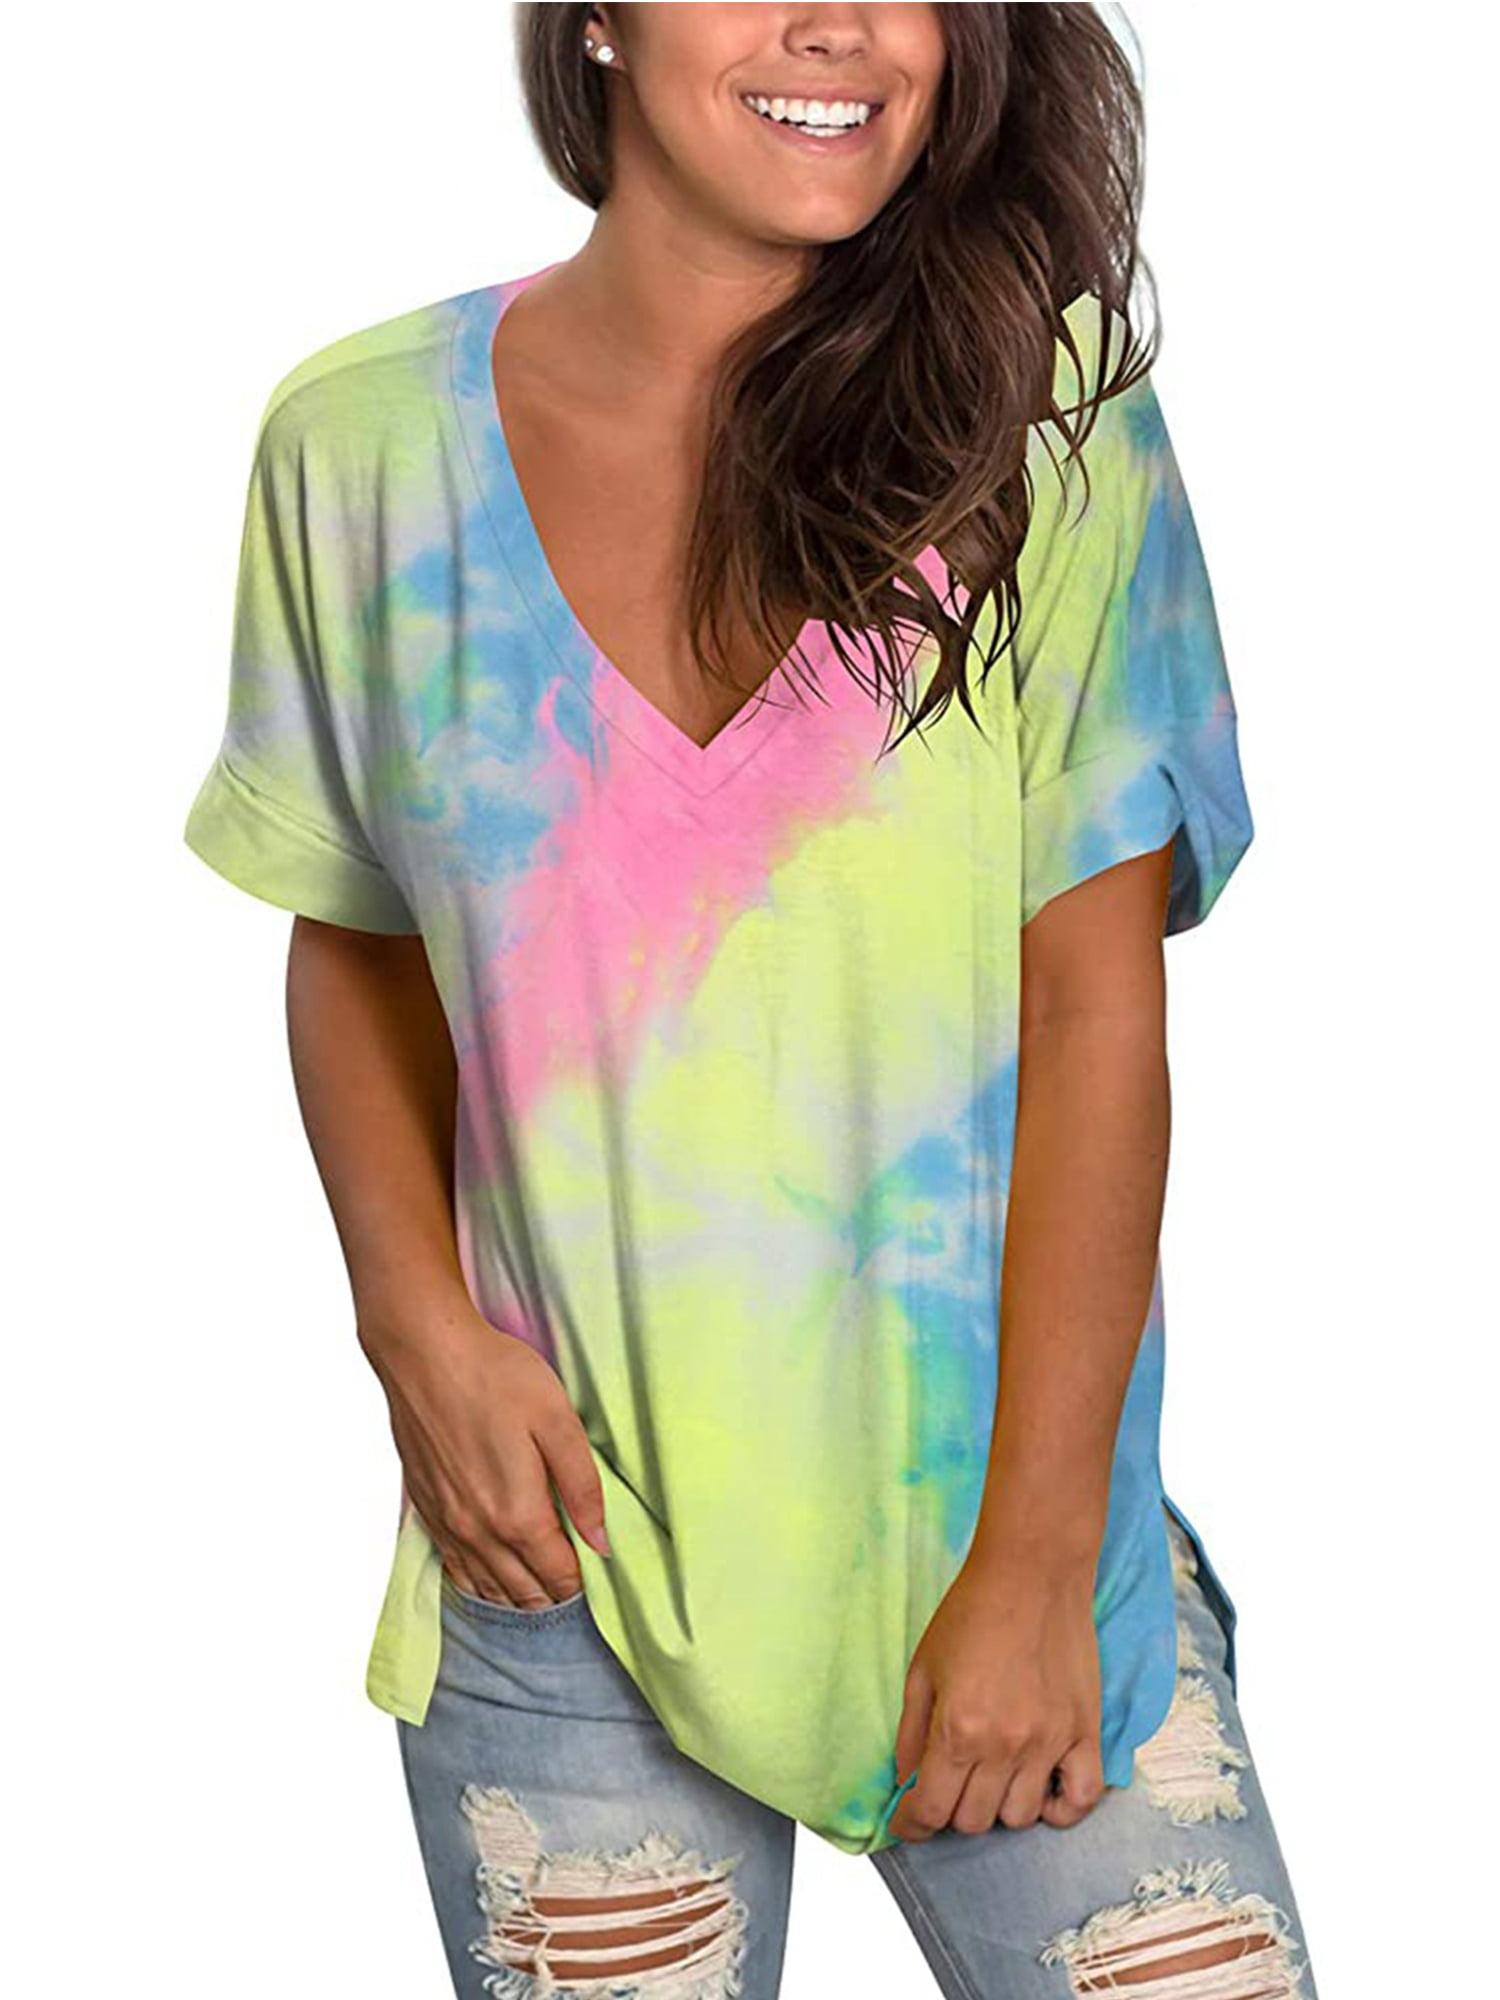 Tops Blouse Women Gradient Loose Tunic Casual V Neck T Shirt Short Sleeve Summer